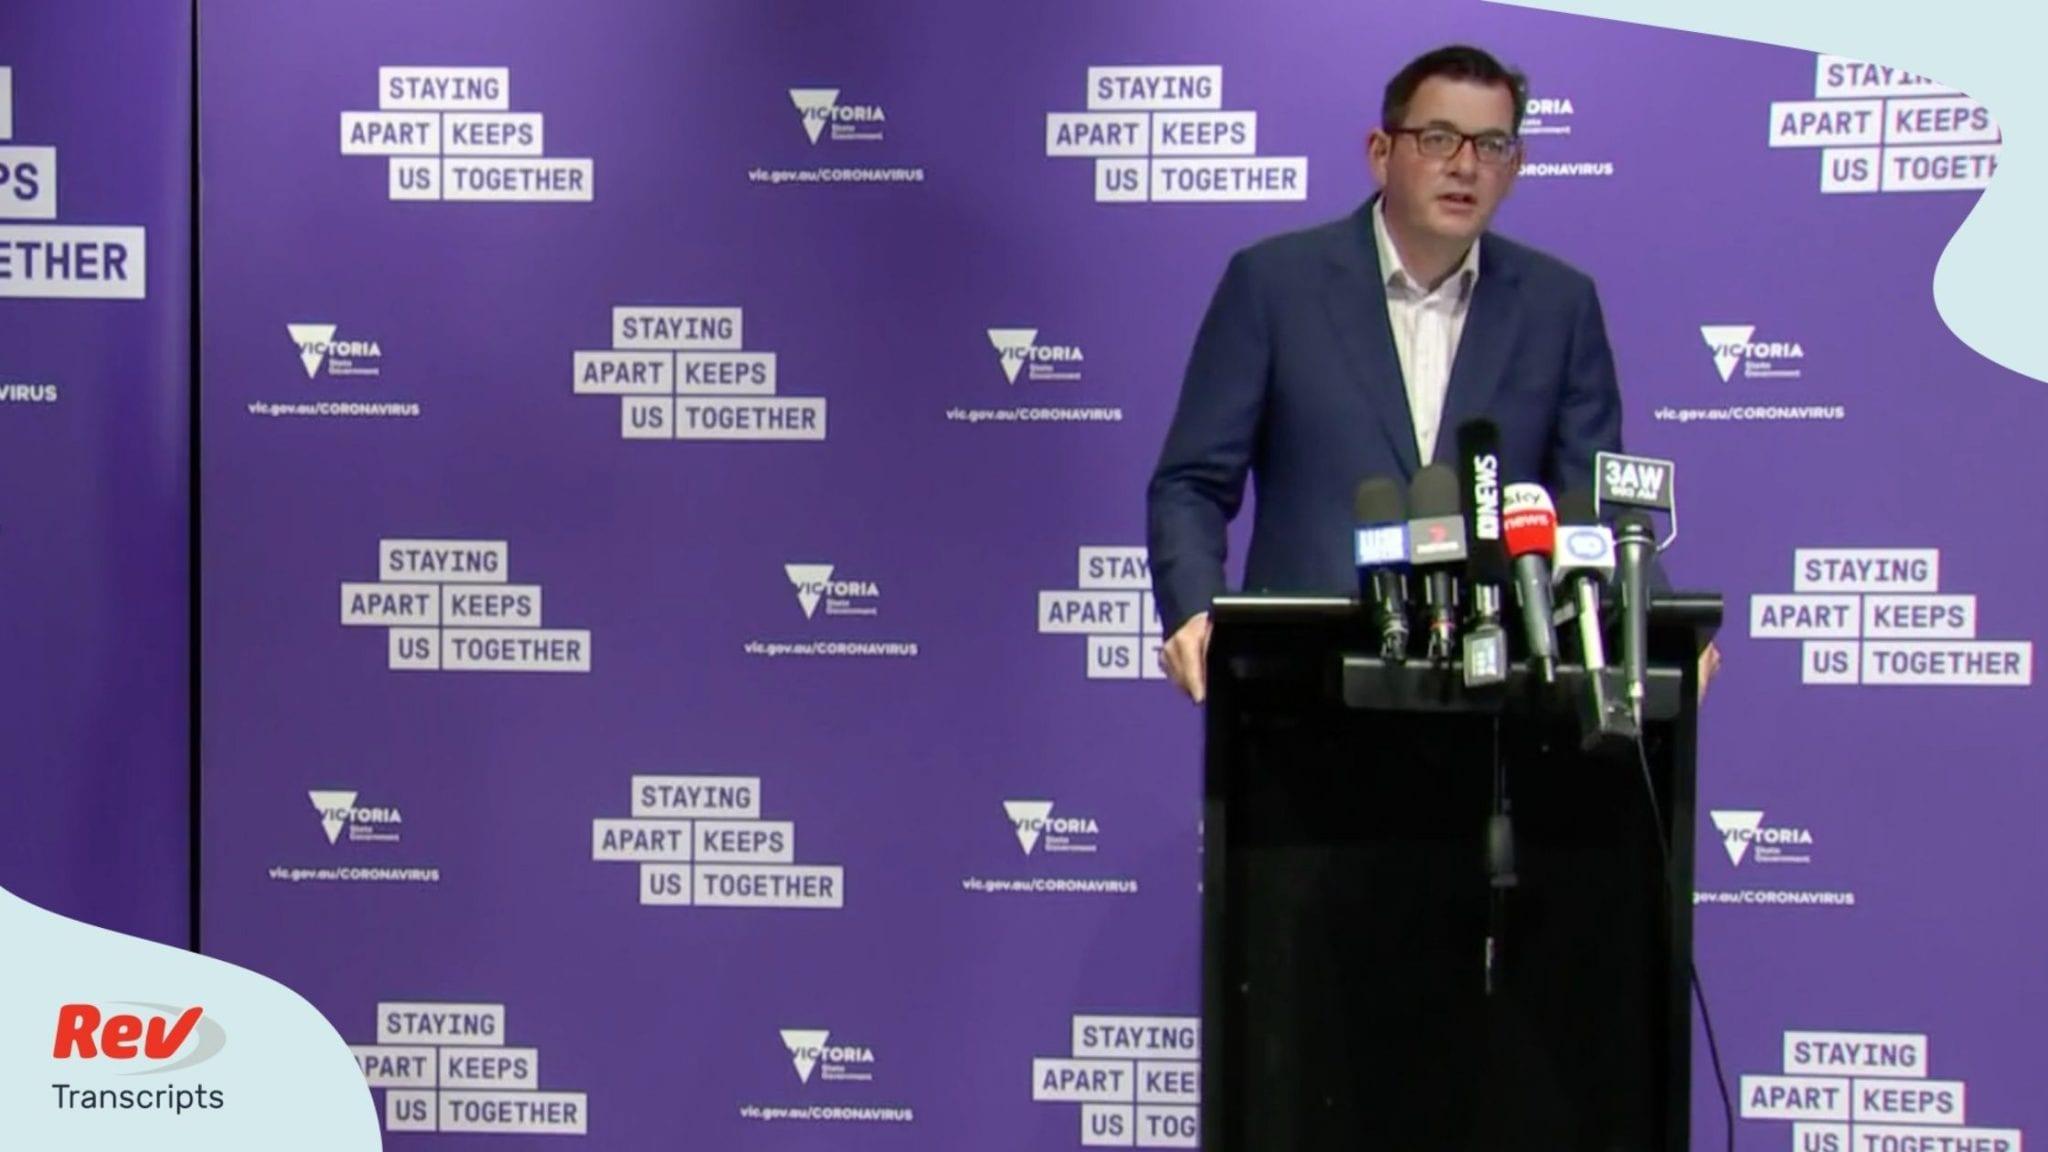 Victoria Premier Dan Andrews Press Conference Transcript August 5 Rev